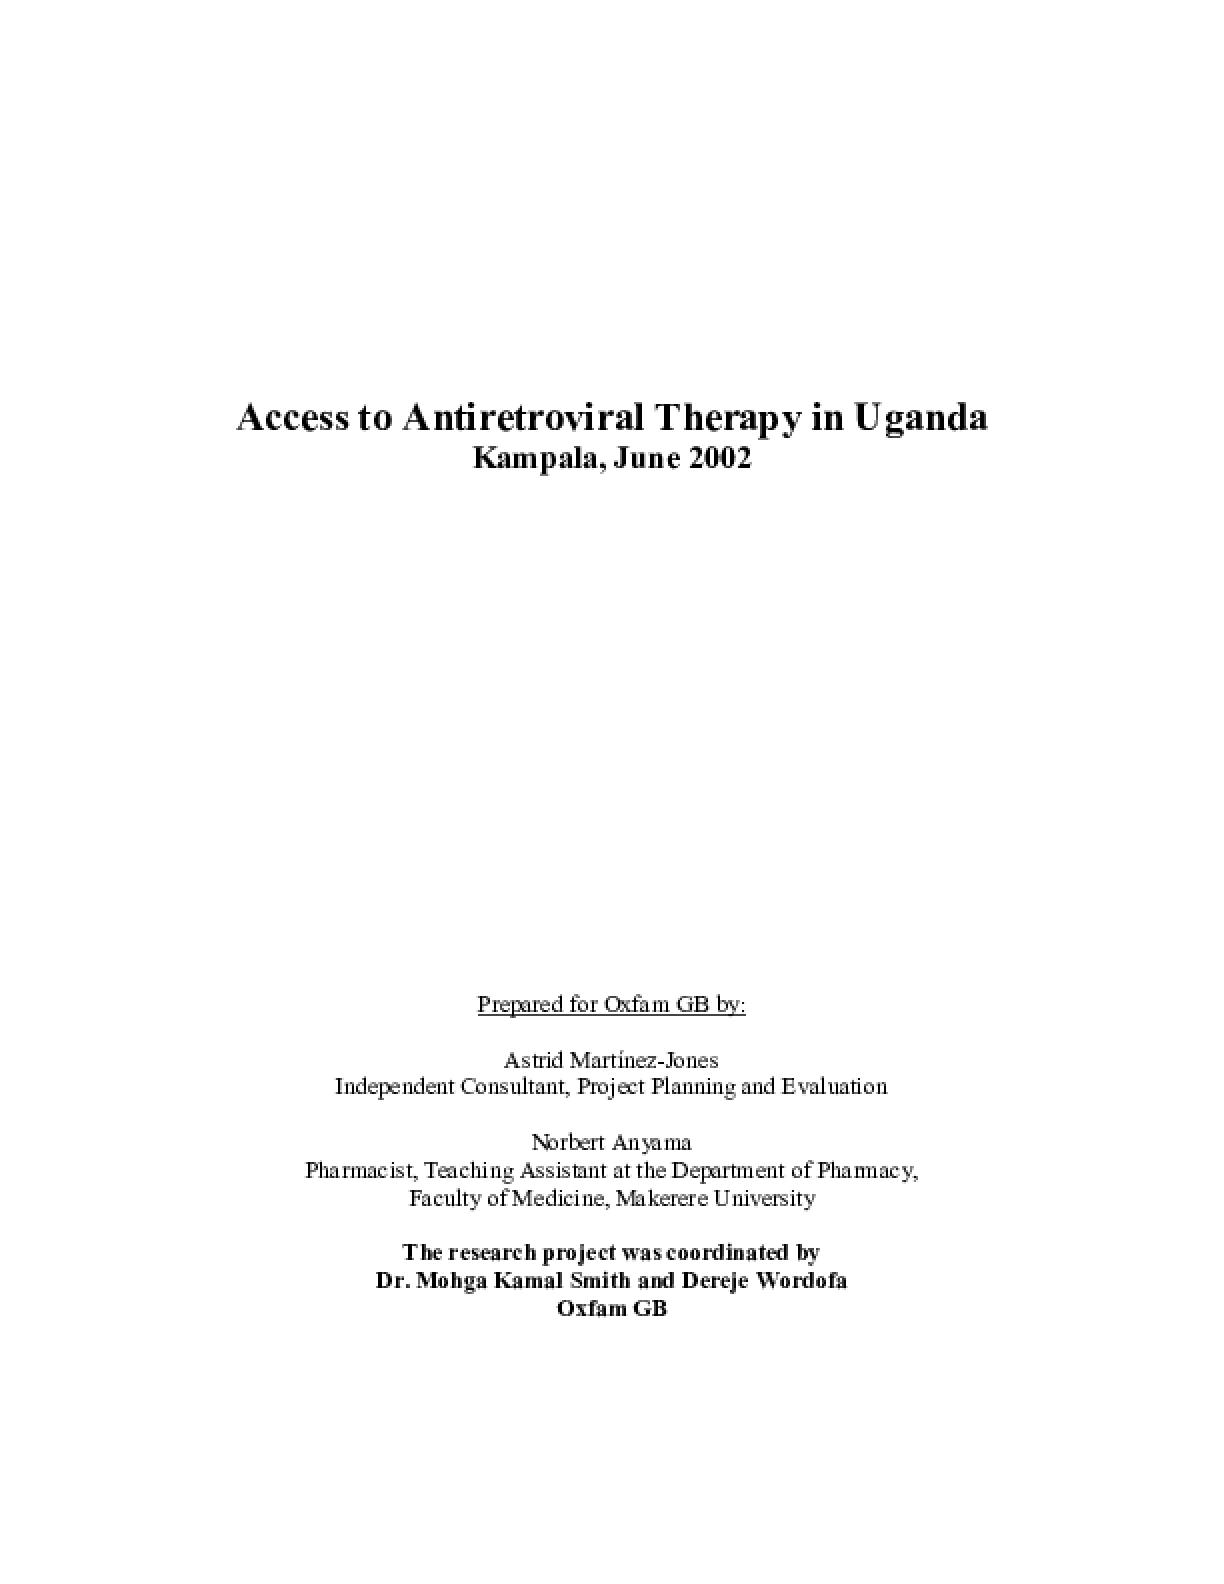 Access to Antiretroviral Therapy in Uganda: Kampala, June 2002